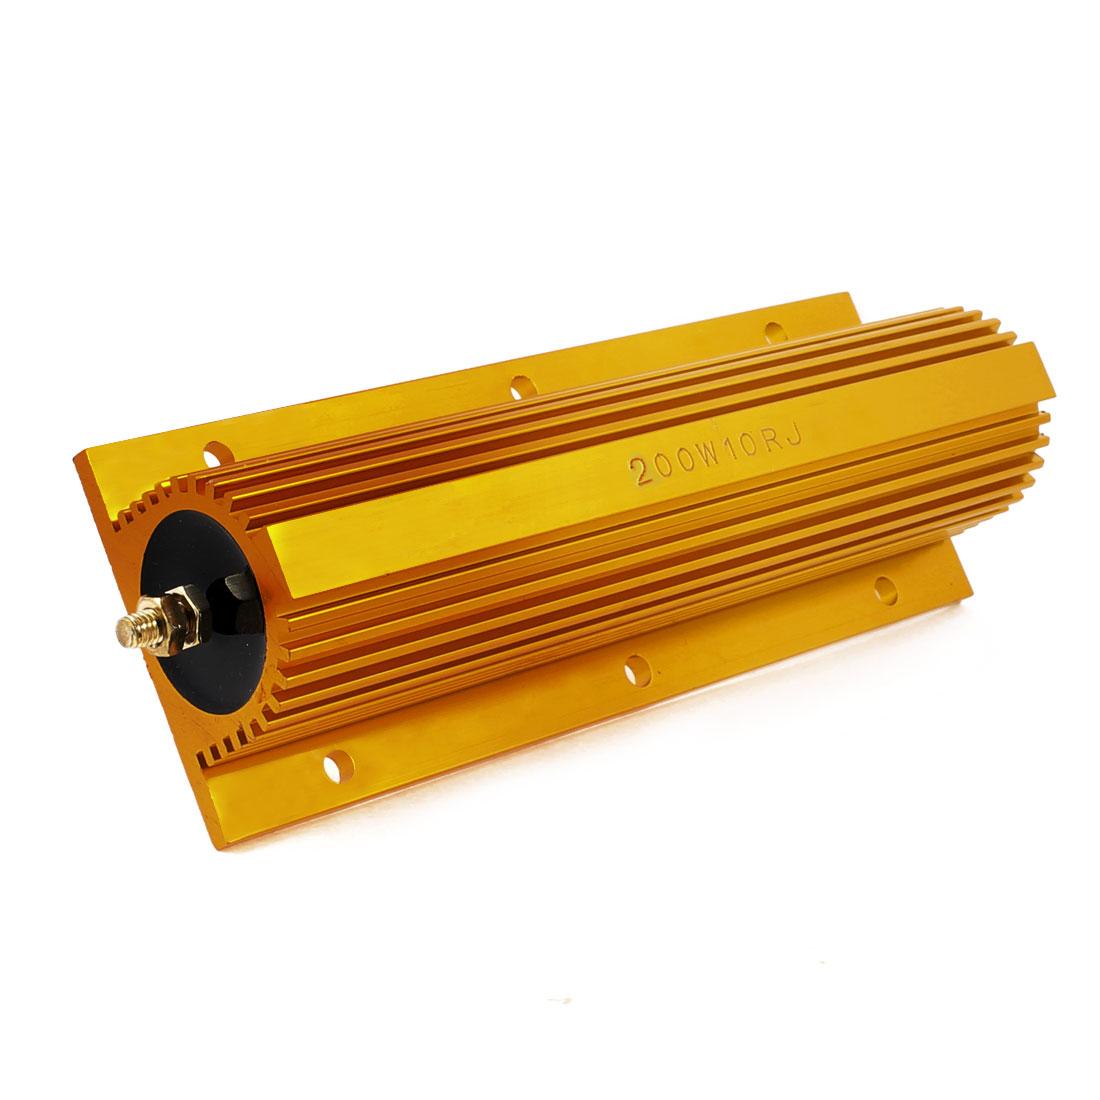 200W 10 Ohm 5% Resistance Aluminum Clad Resistor Gold Tone